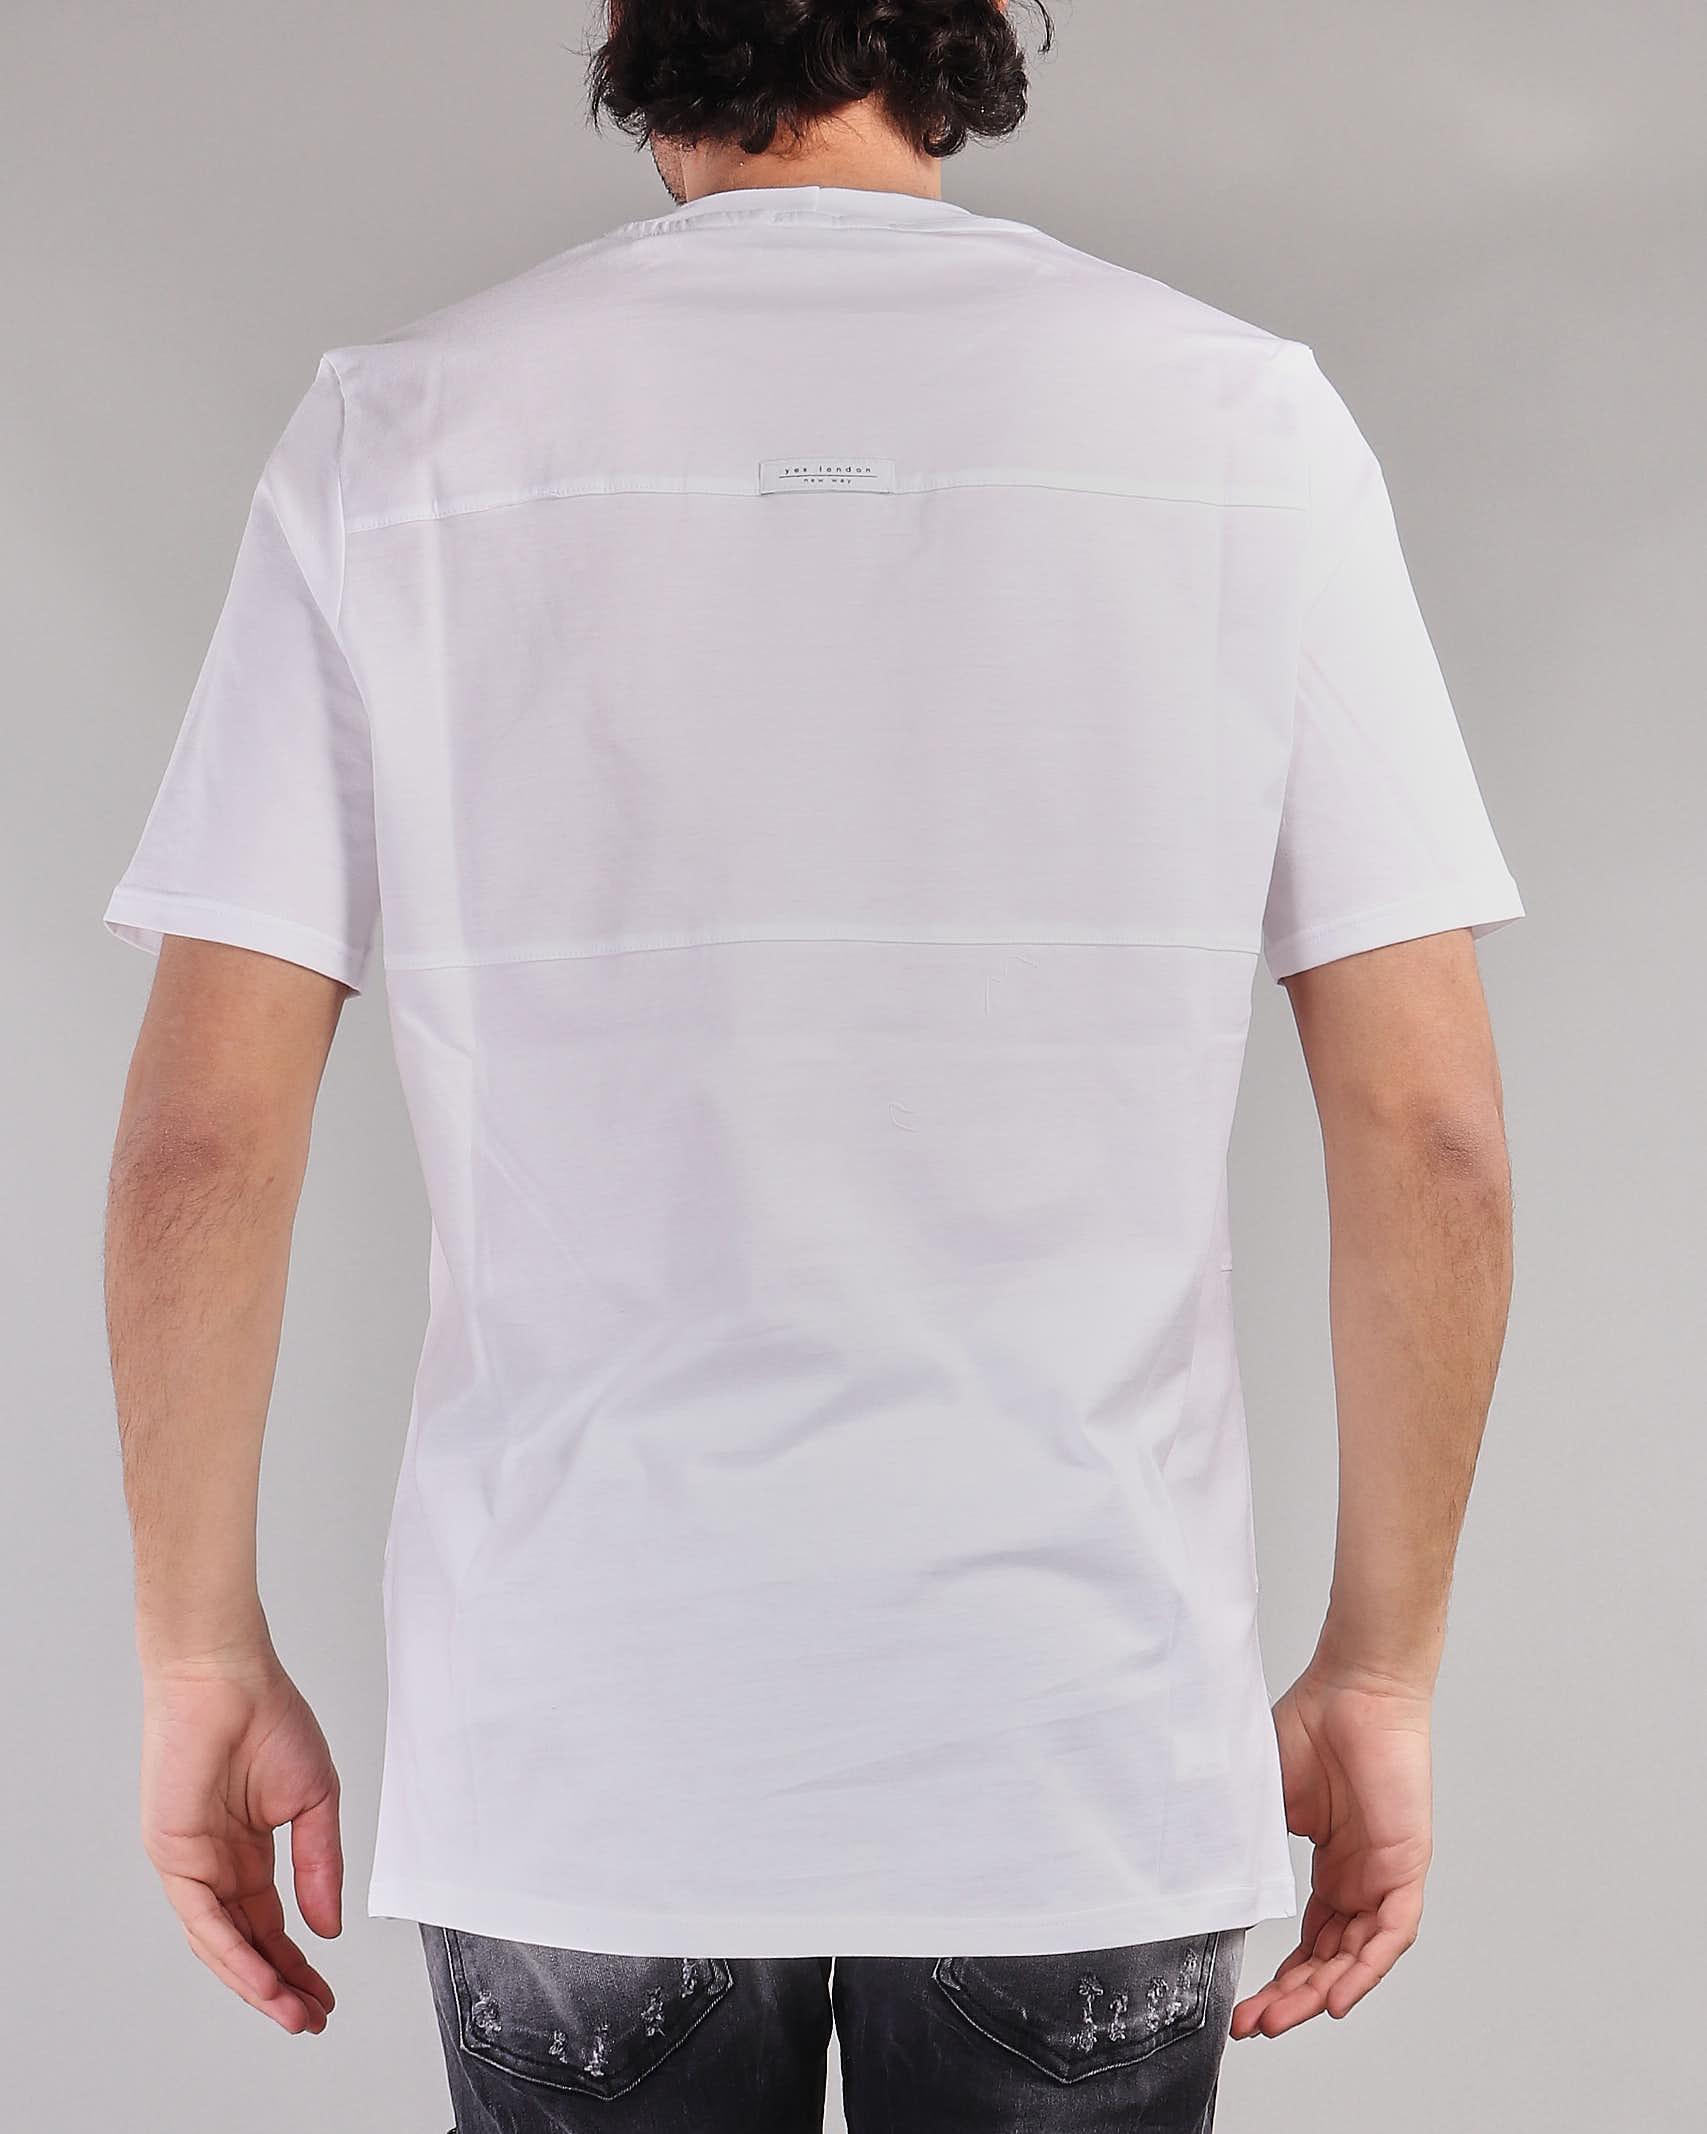 T-shirt in cotone Yes London YES LONDON | T-shirt | XM3864BIANCO